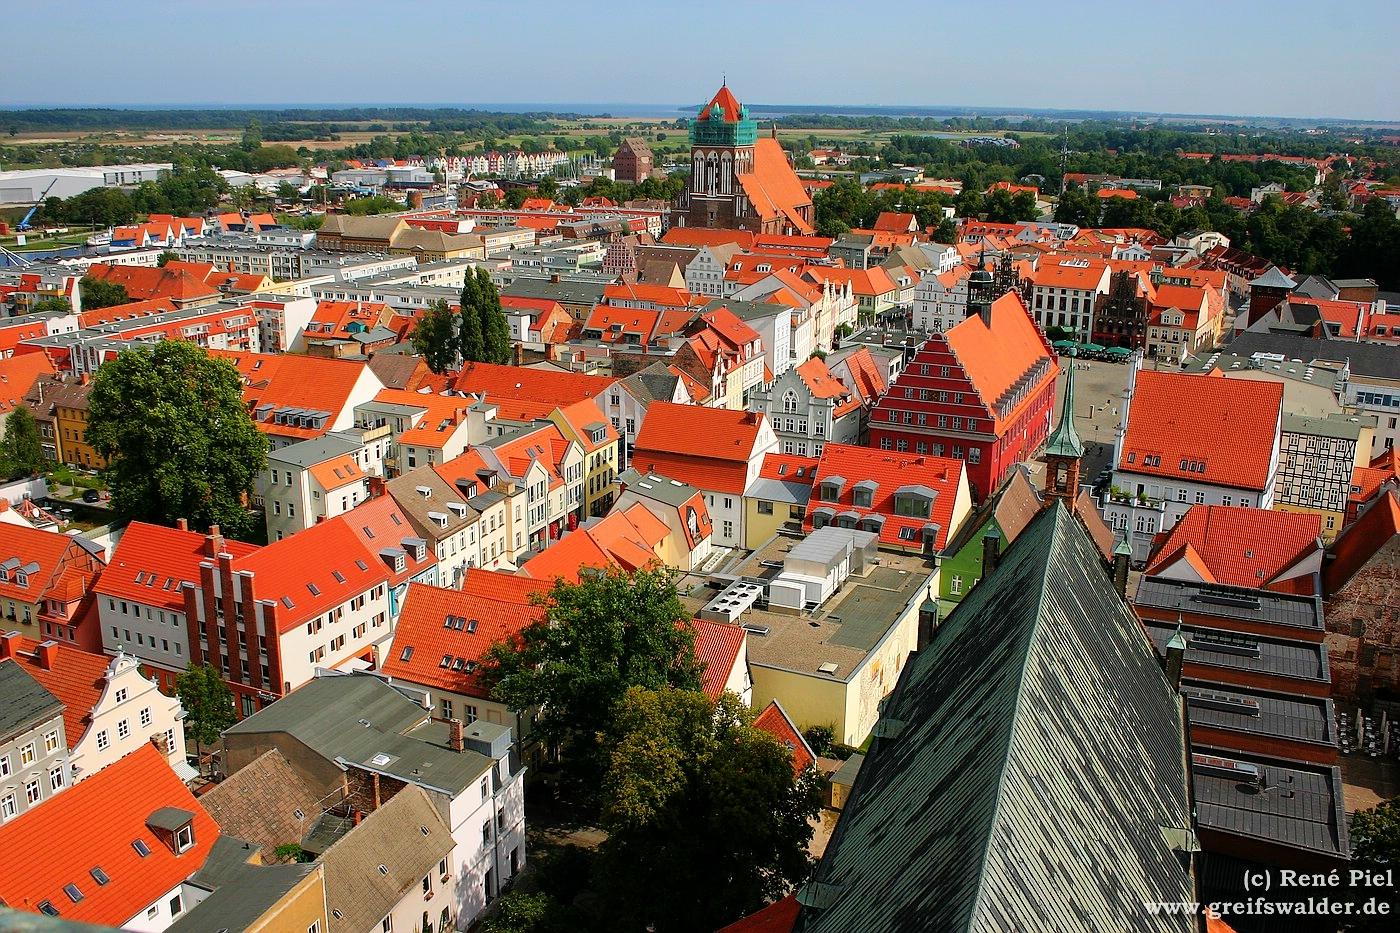 Blick vom Dom St. Nikolai auf Greifswald